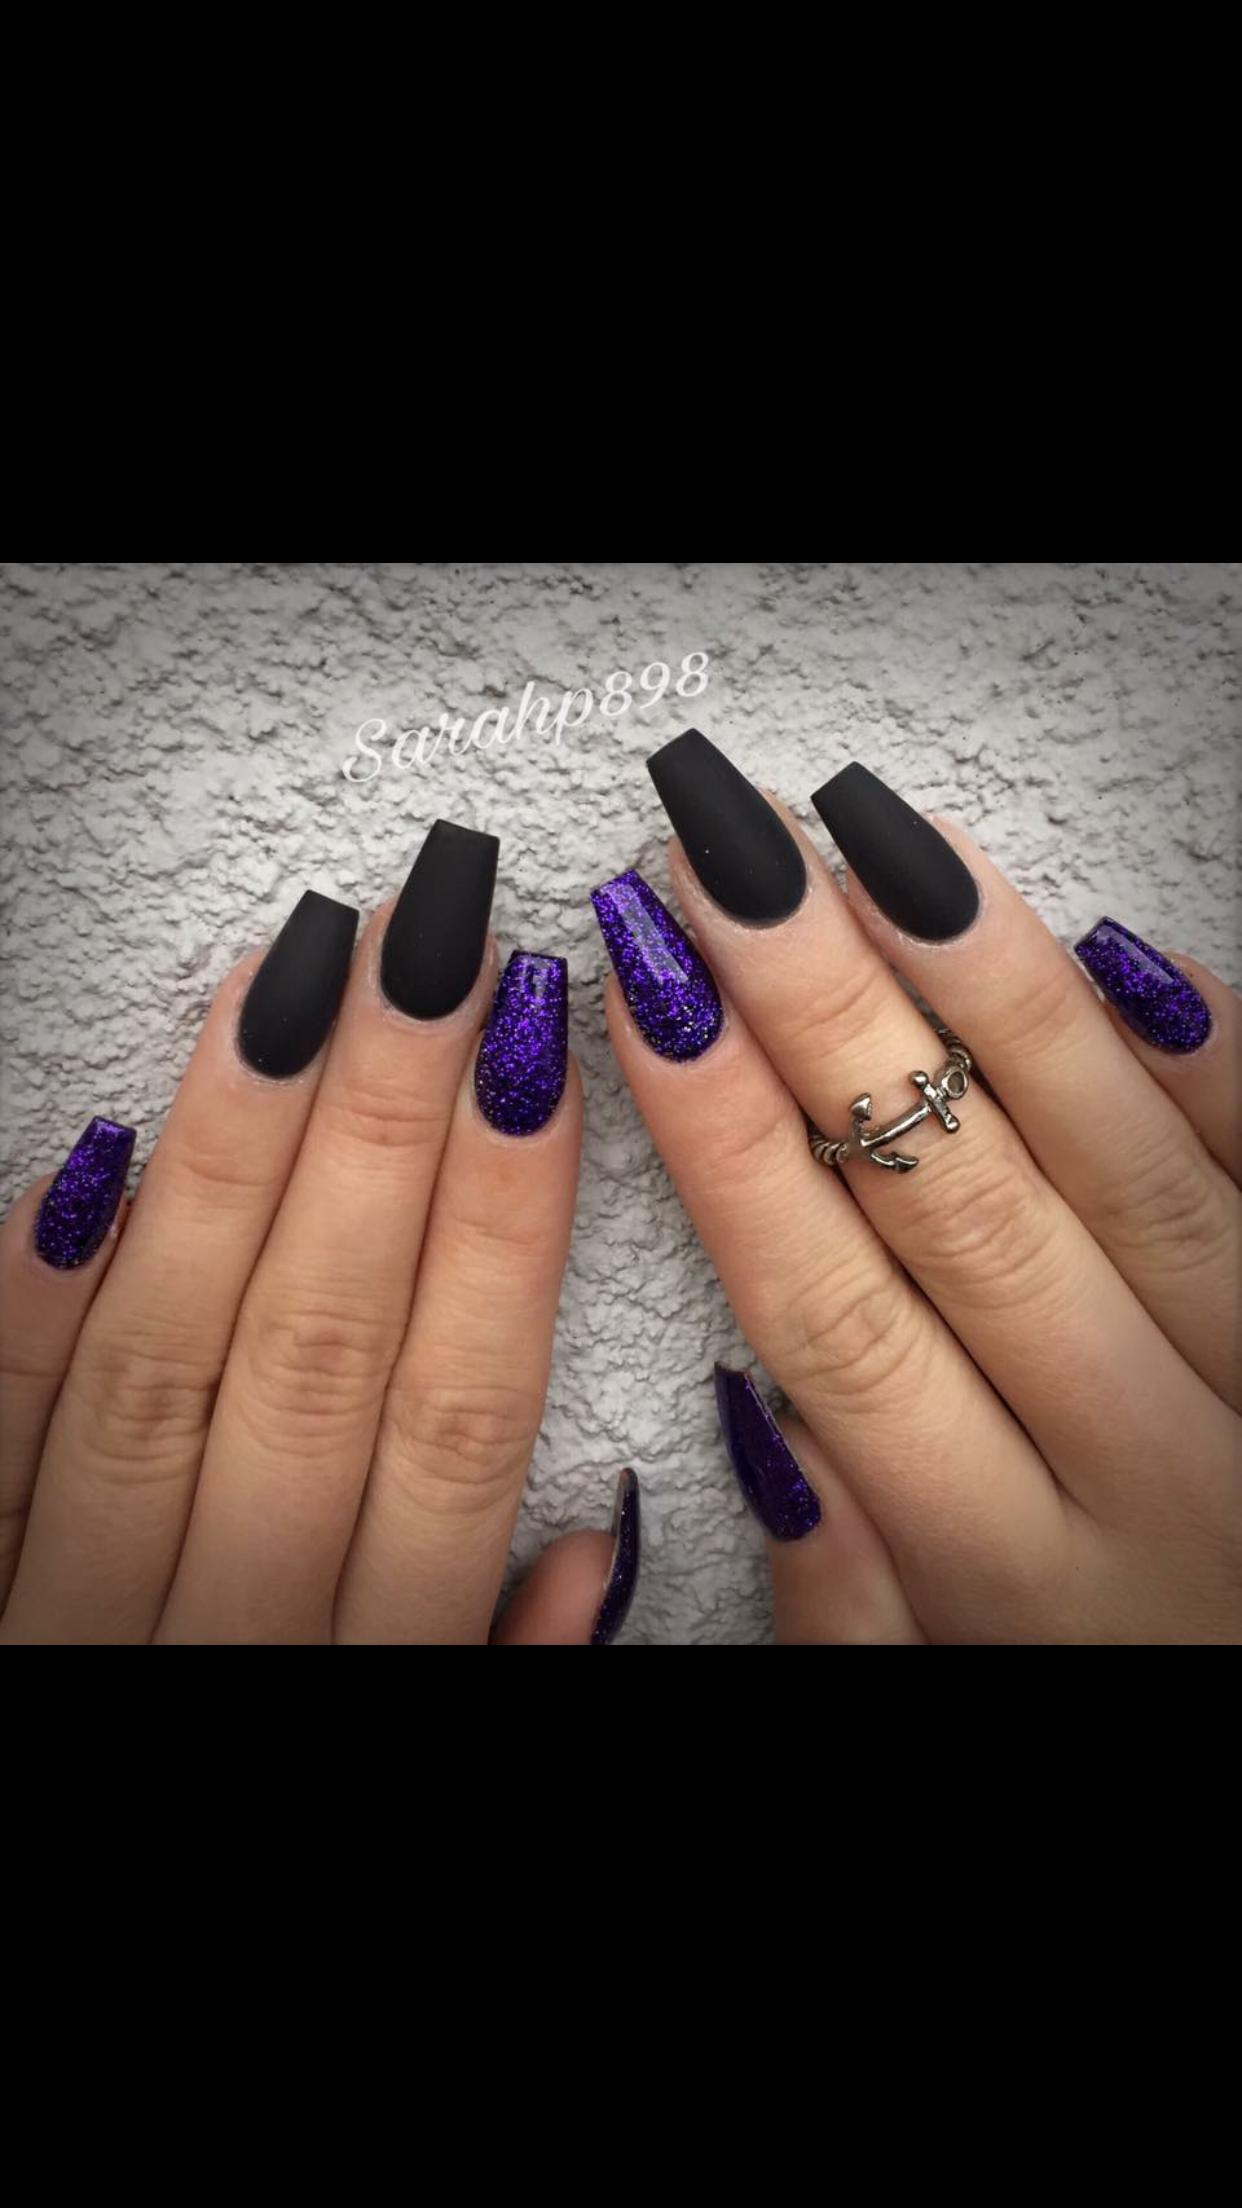 #purple #acrylic #black #sparkle #nails | Holloween nails ...